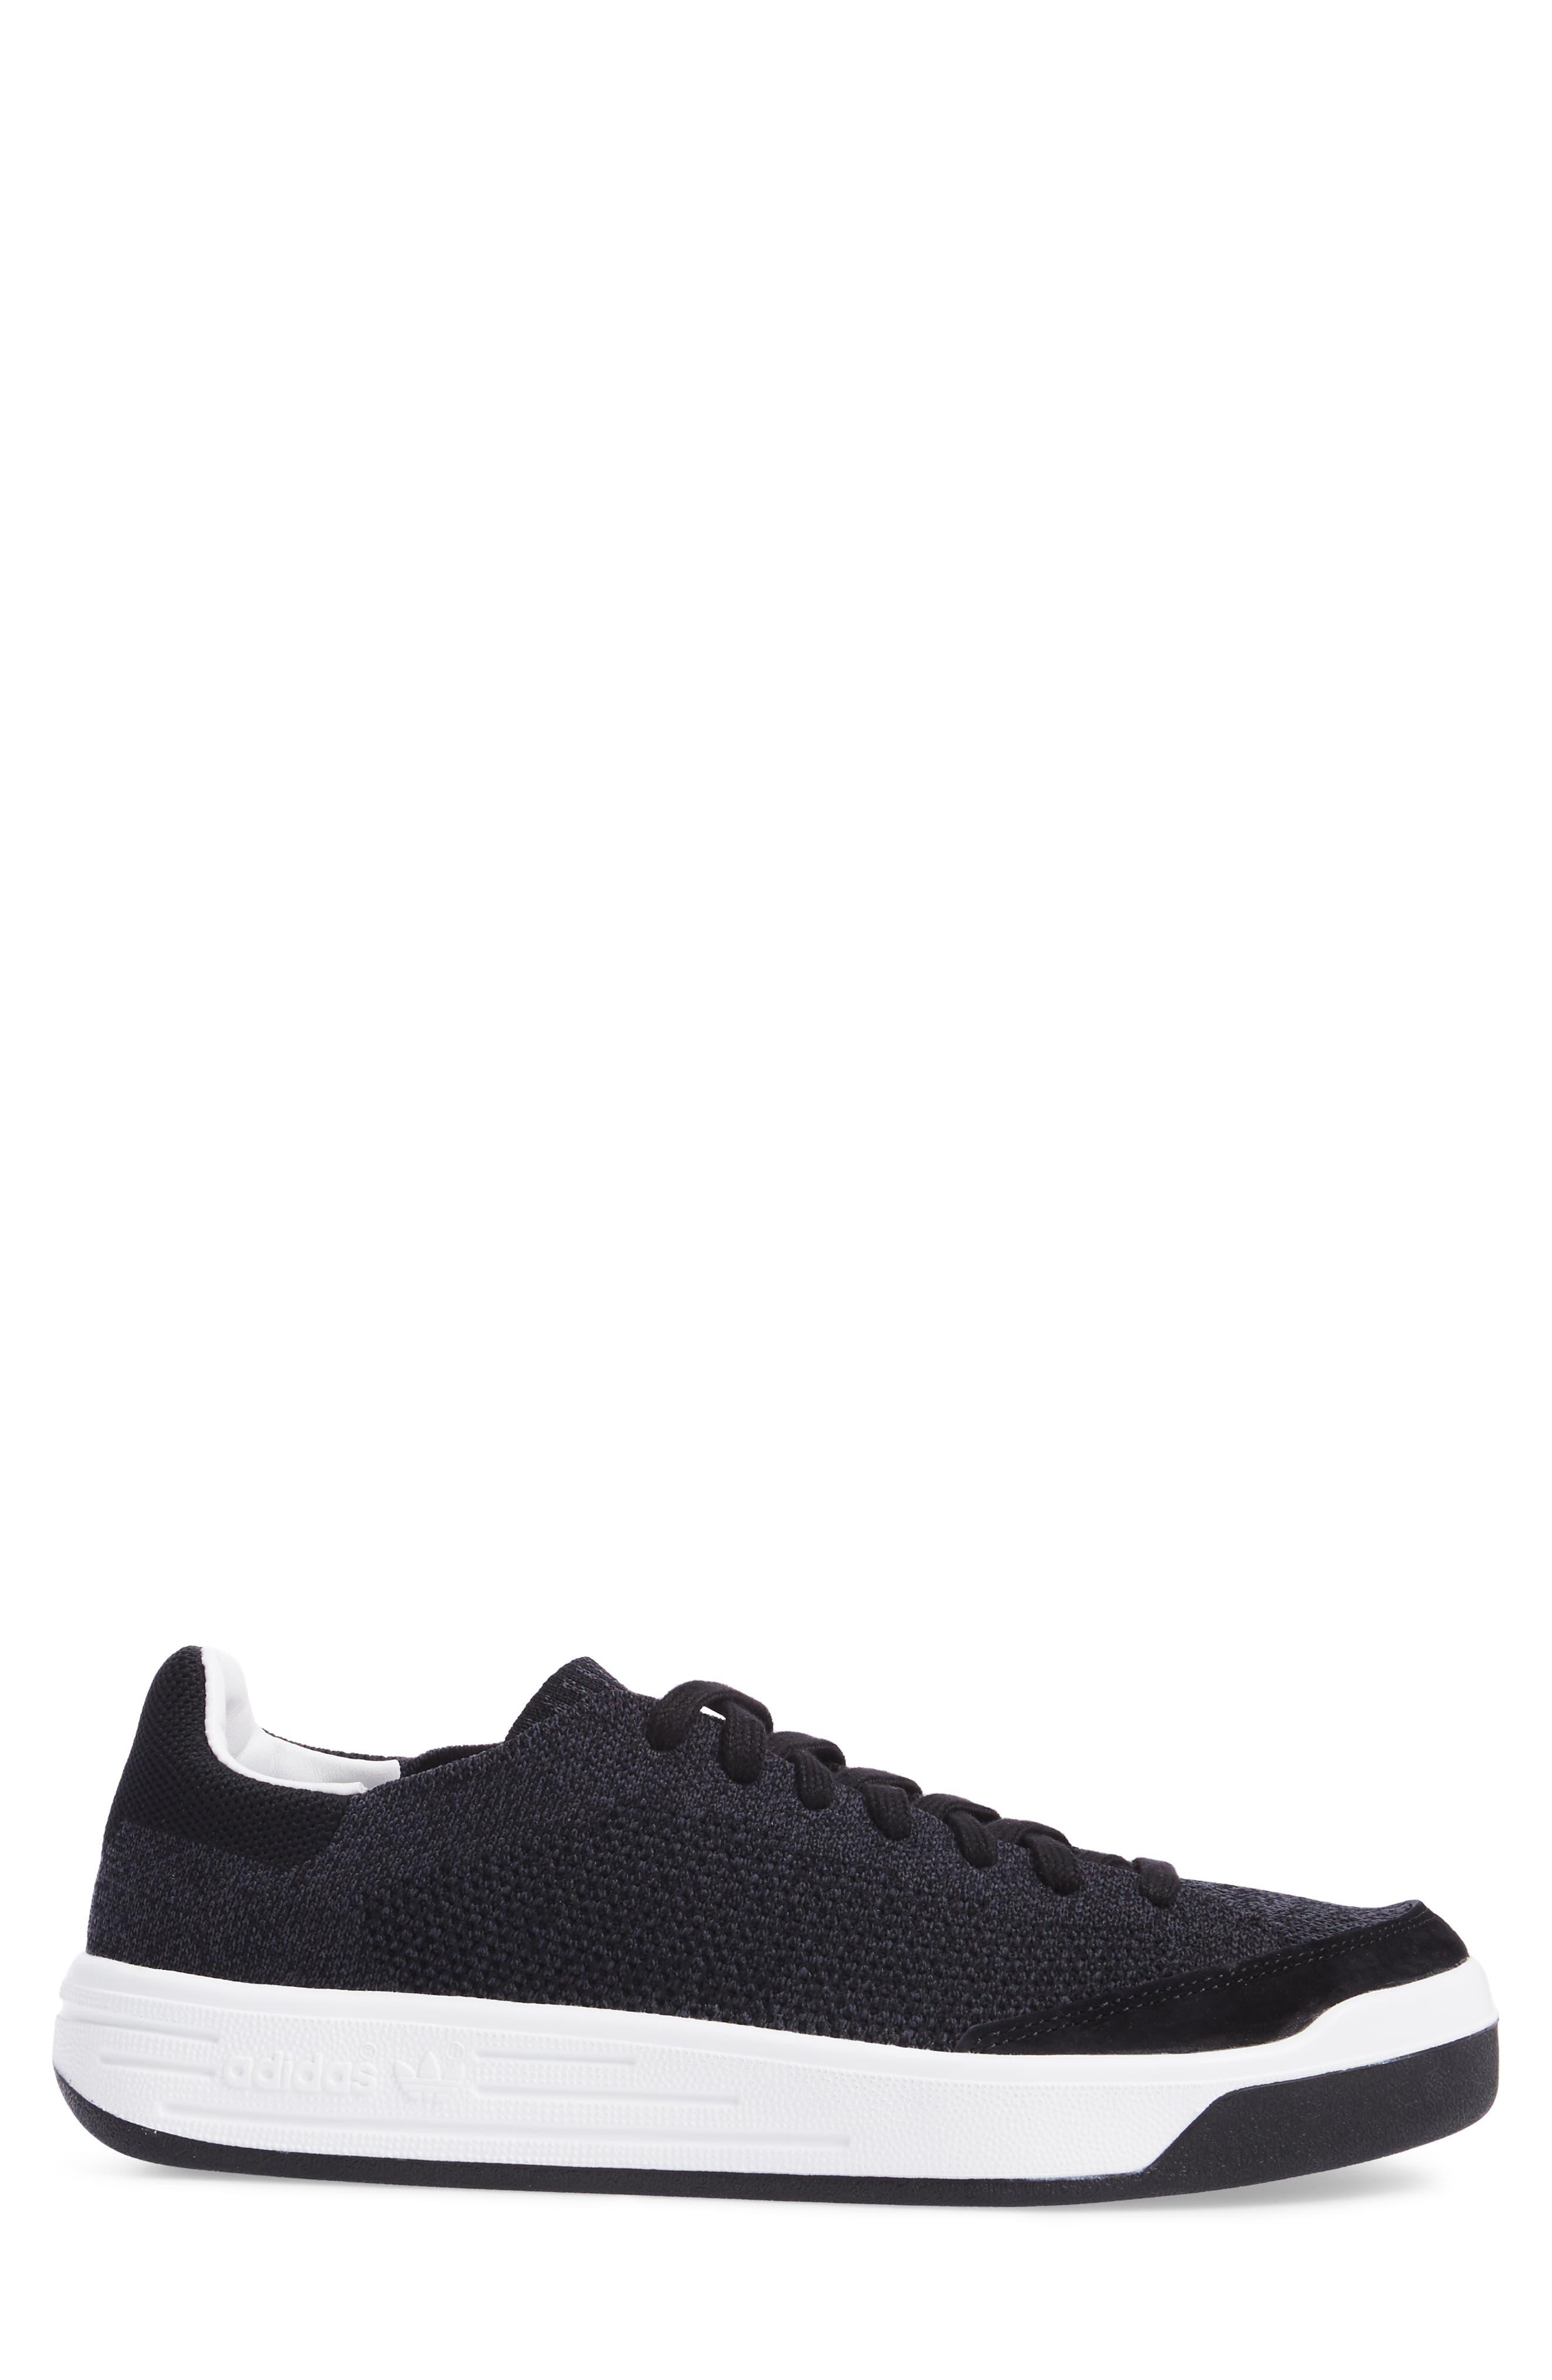 Rod Laver Super Primeknit Sneaker,                             Alternate thumbnail 3, color,                             001